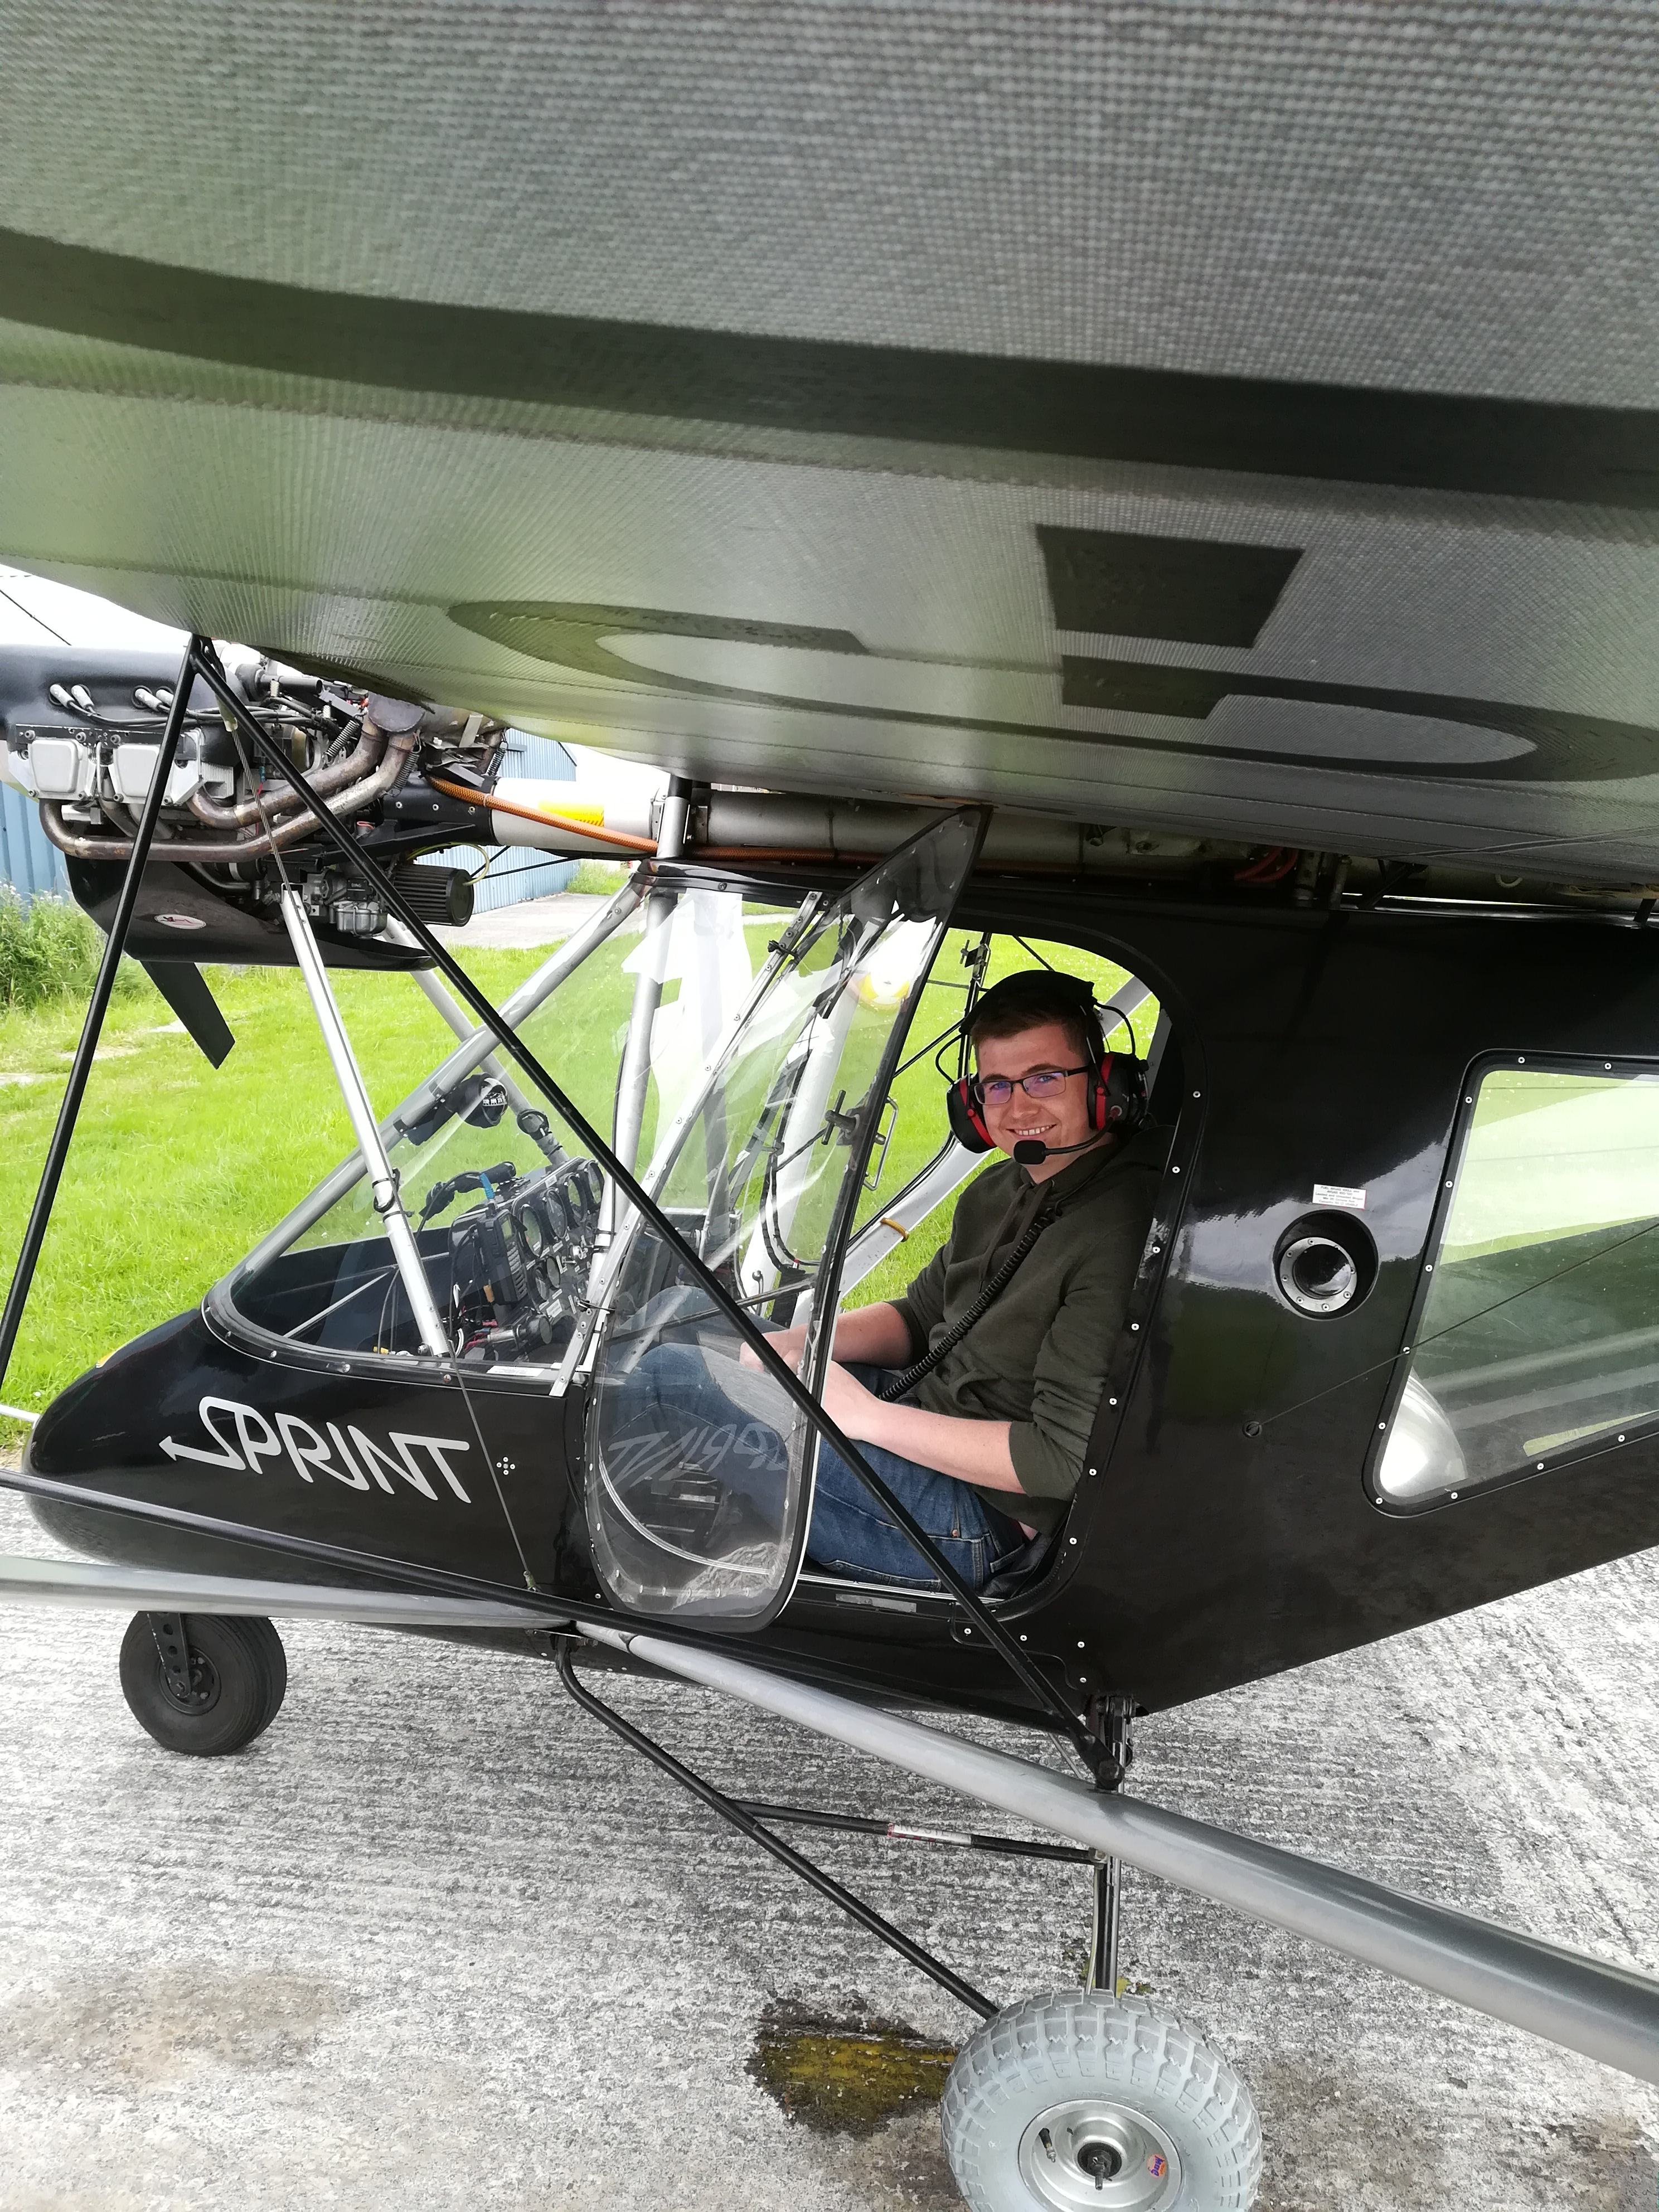 Jack Toner's First Solo Flight